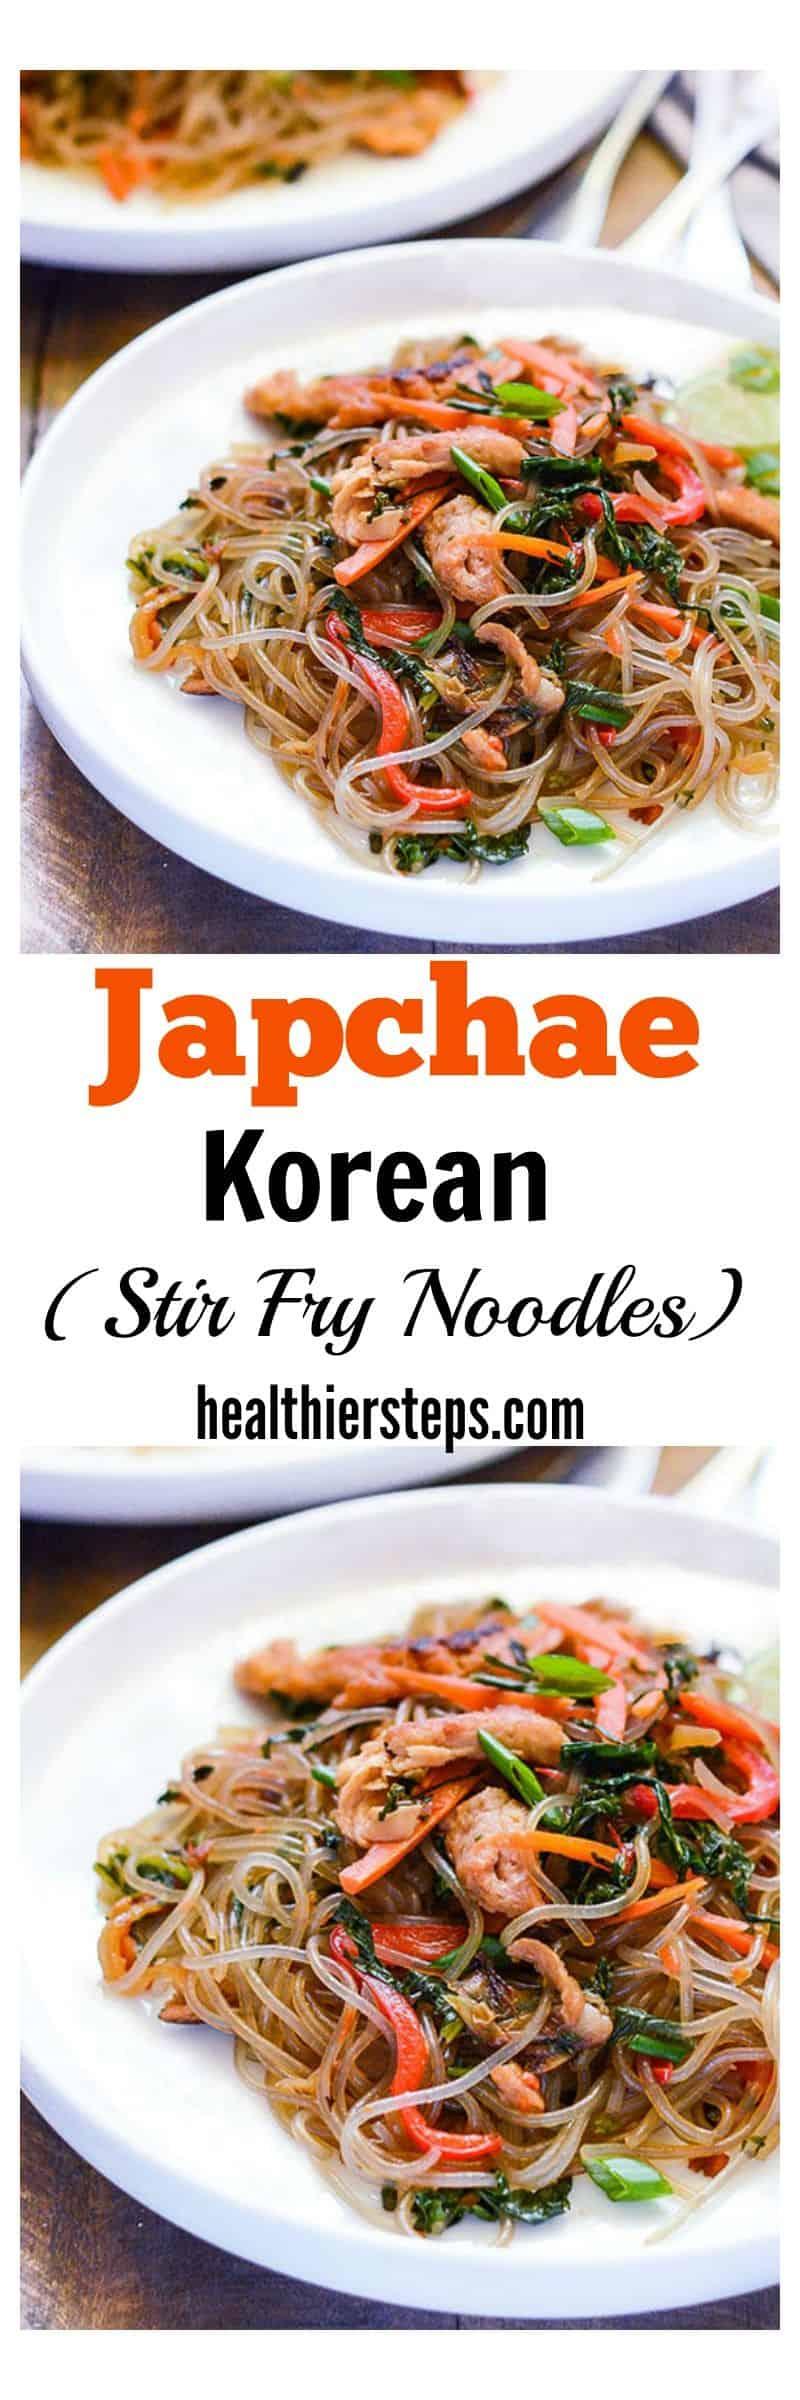 Japchae Korean Stir Fry Noodles